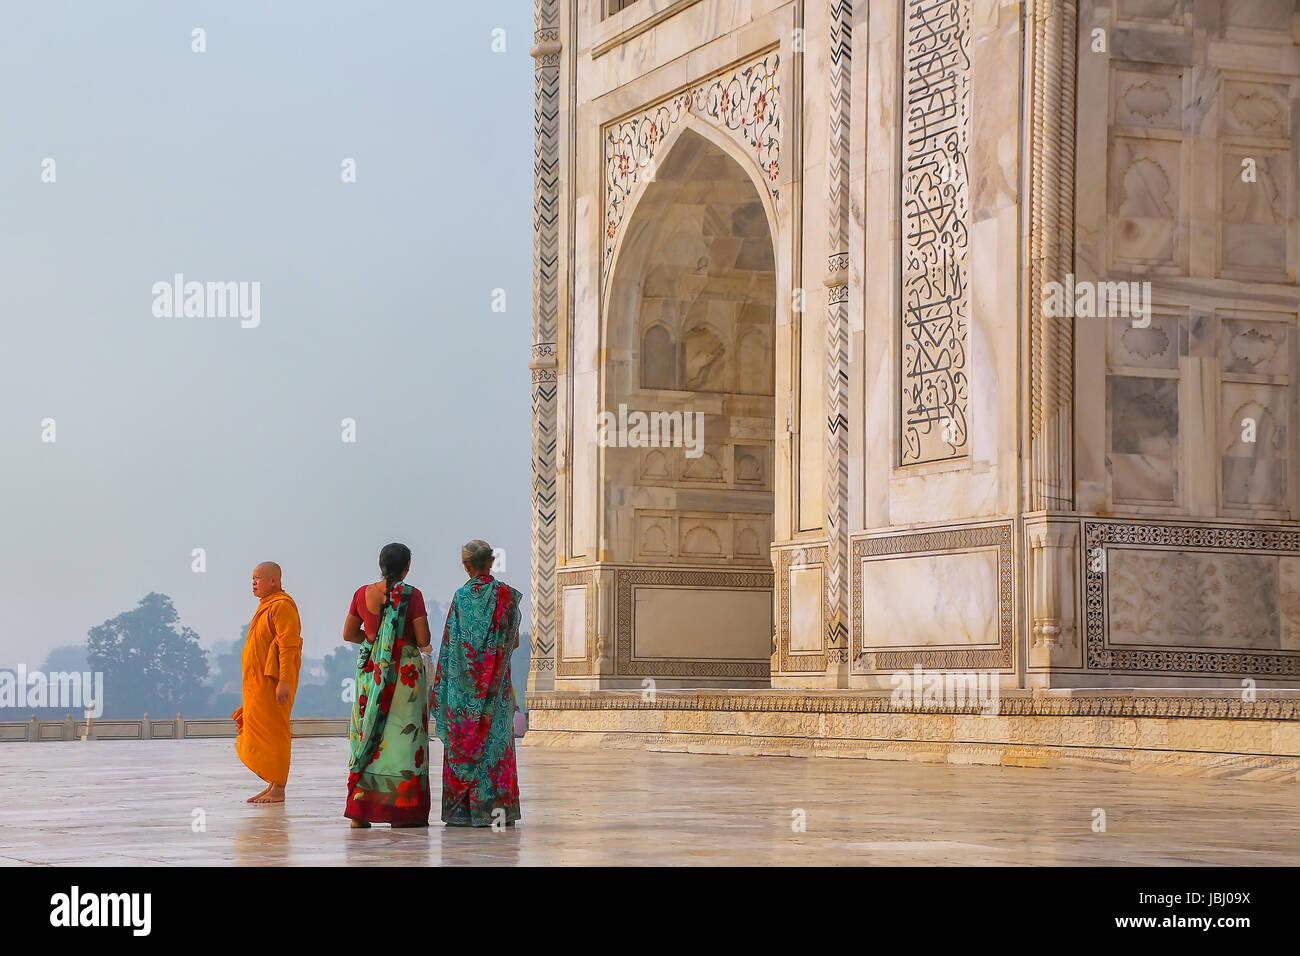 Touristen stehen außen Taj Mahal in Agra, Uttar Pradesh, Indien. Taj Mahal wurde 1983 zum UNESCO-Weltkulturerbe Stockbild